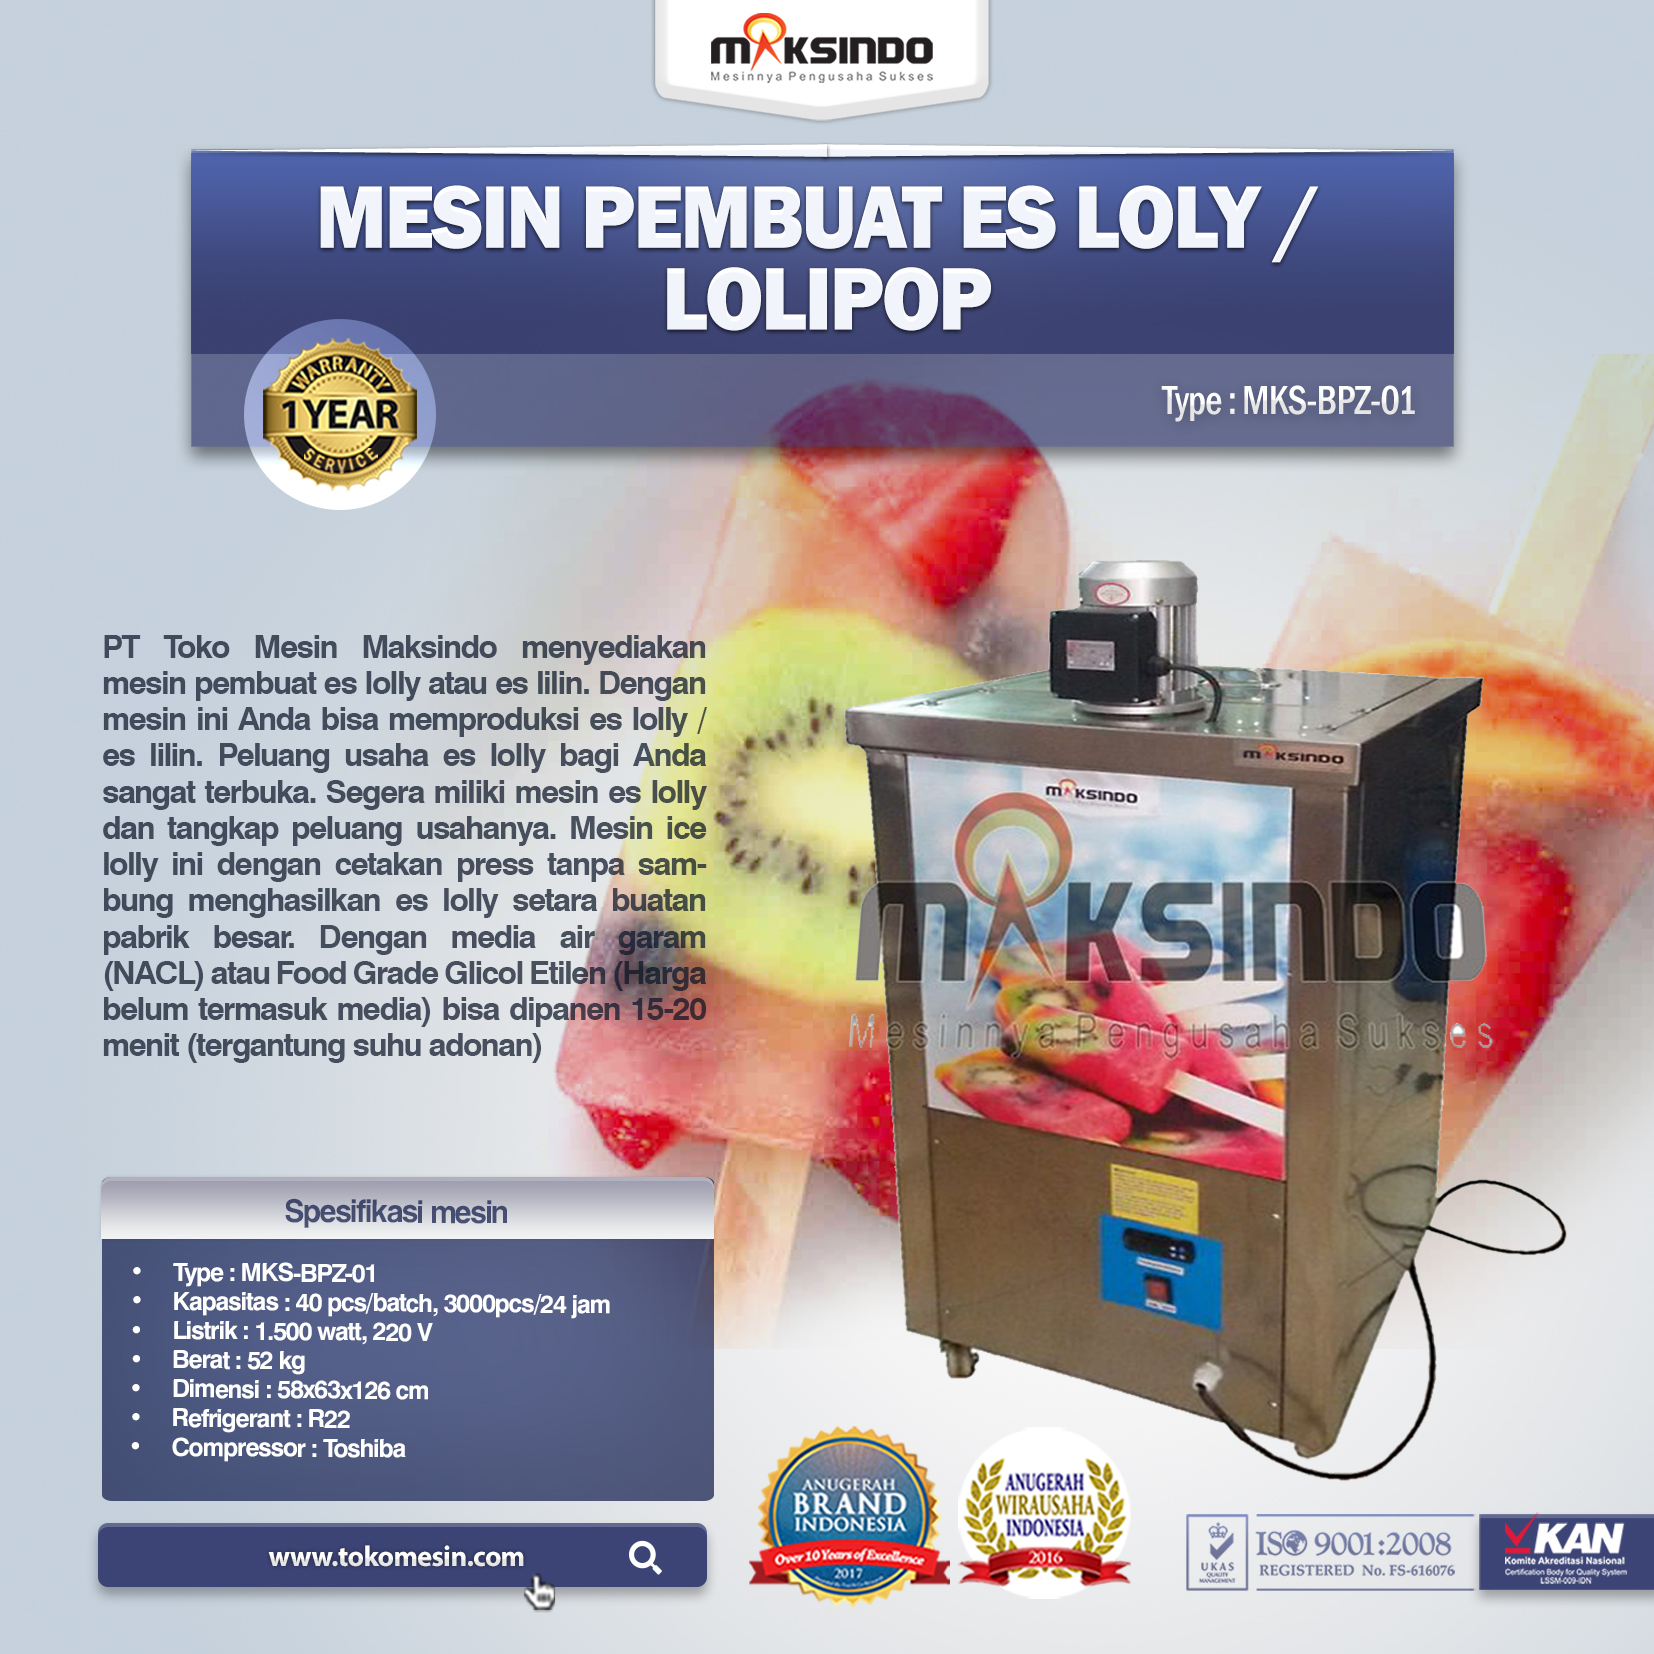 Mesin Pembuat Es Loly Lolipop MKS-BPZ-01